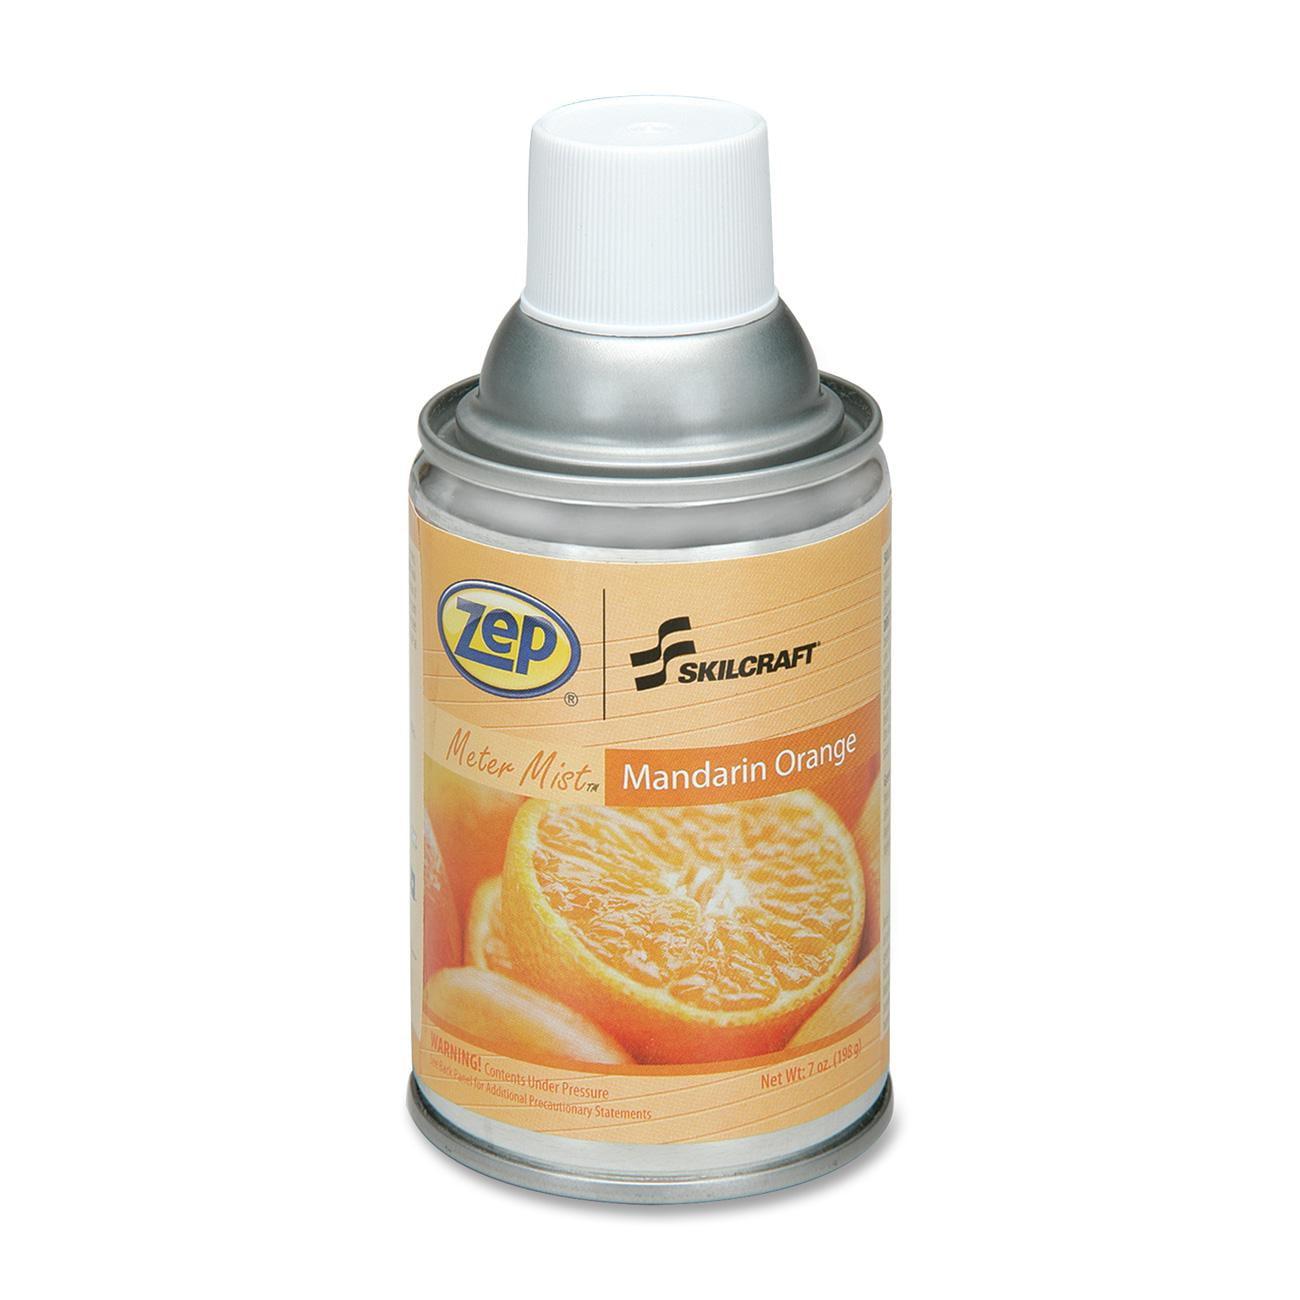 Skilcraft Air Freshener Meter Mist Refill, Mandarin Orange Scent 4598263